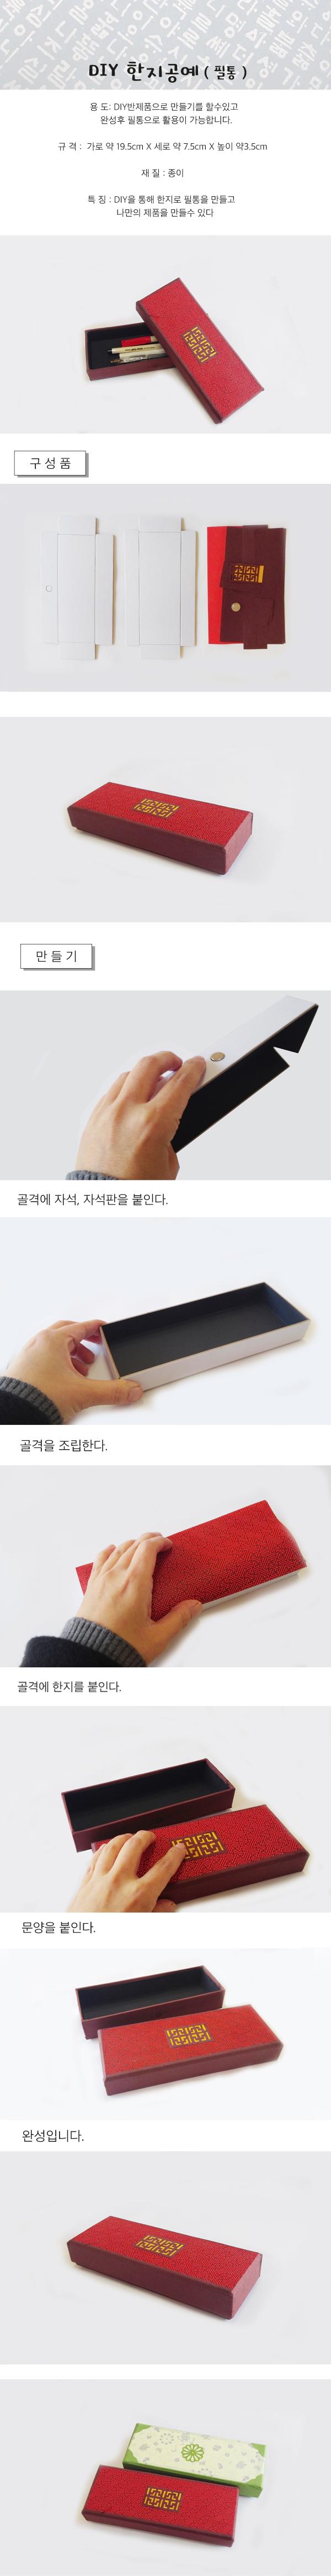 DIY 한지공예 자석필통 만들기(붉은색) - 대문닷컴, 6,000원, 화방지류, 한지공예